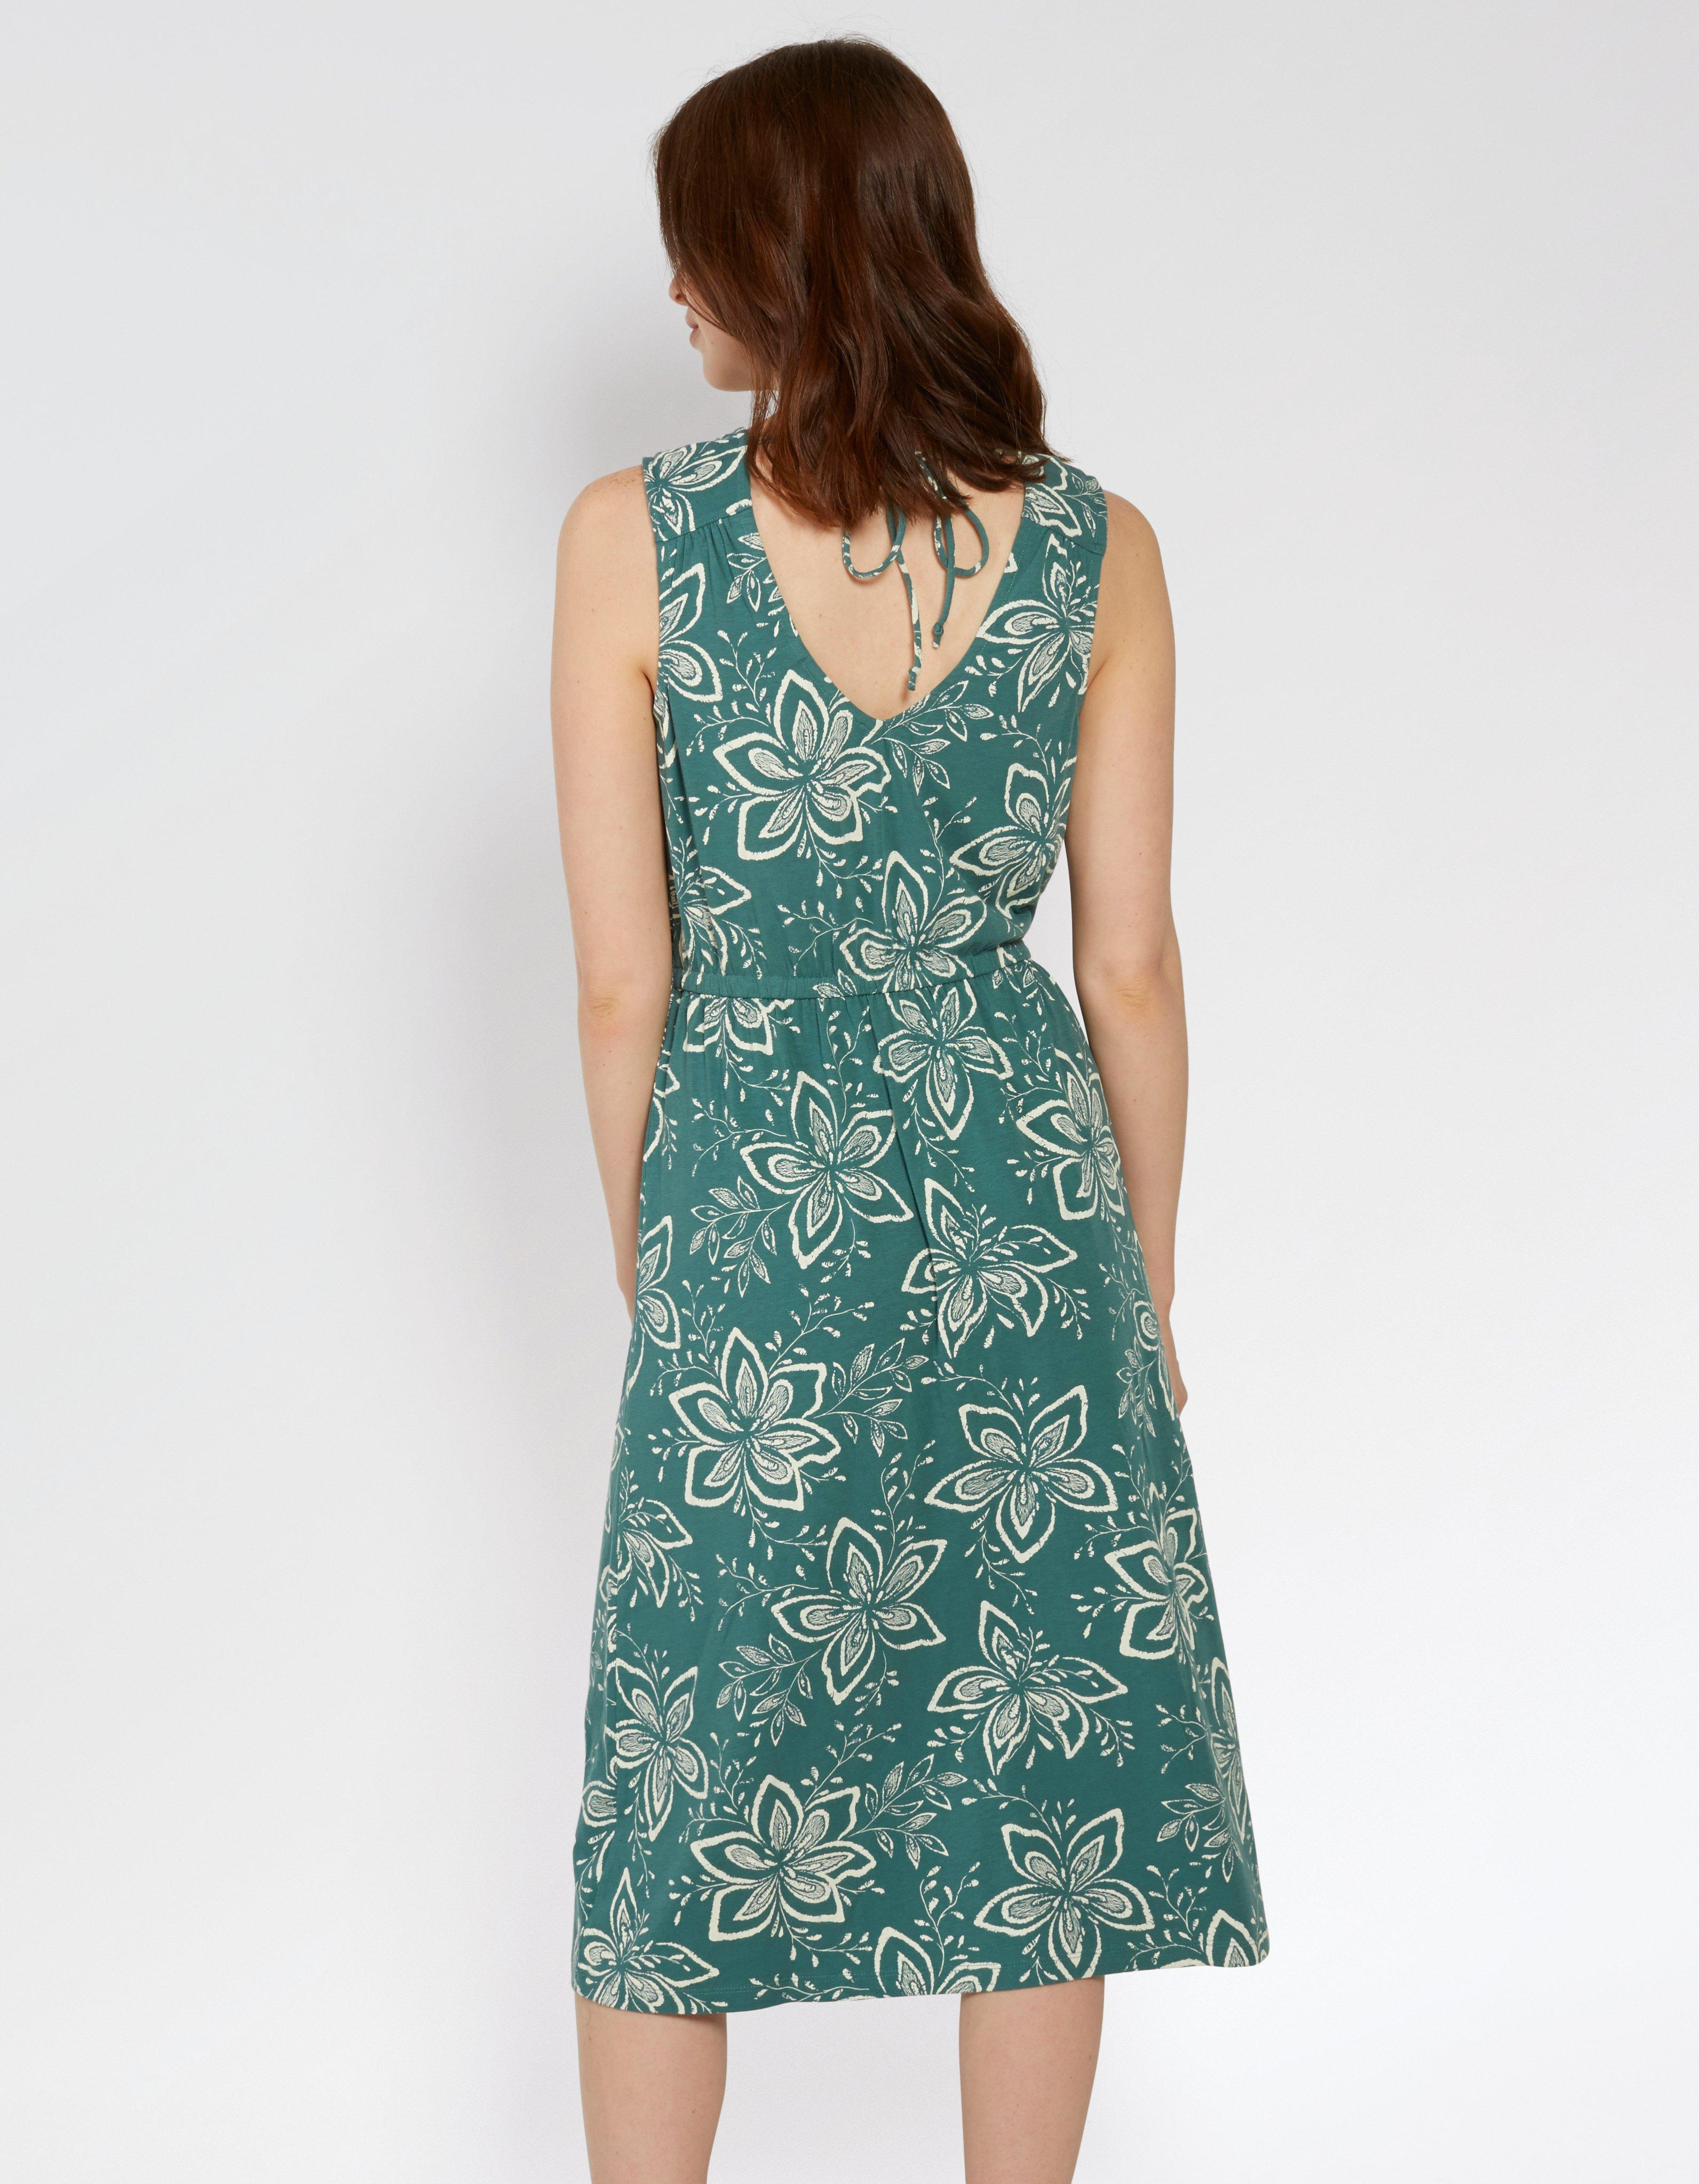 Blair Star Flower Midi Dress